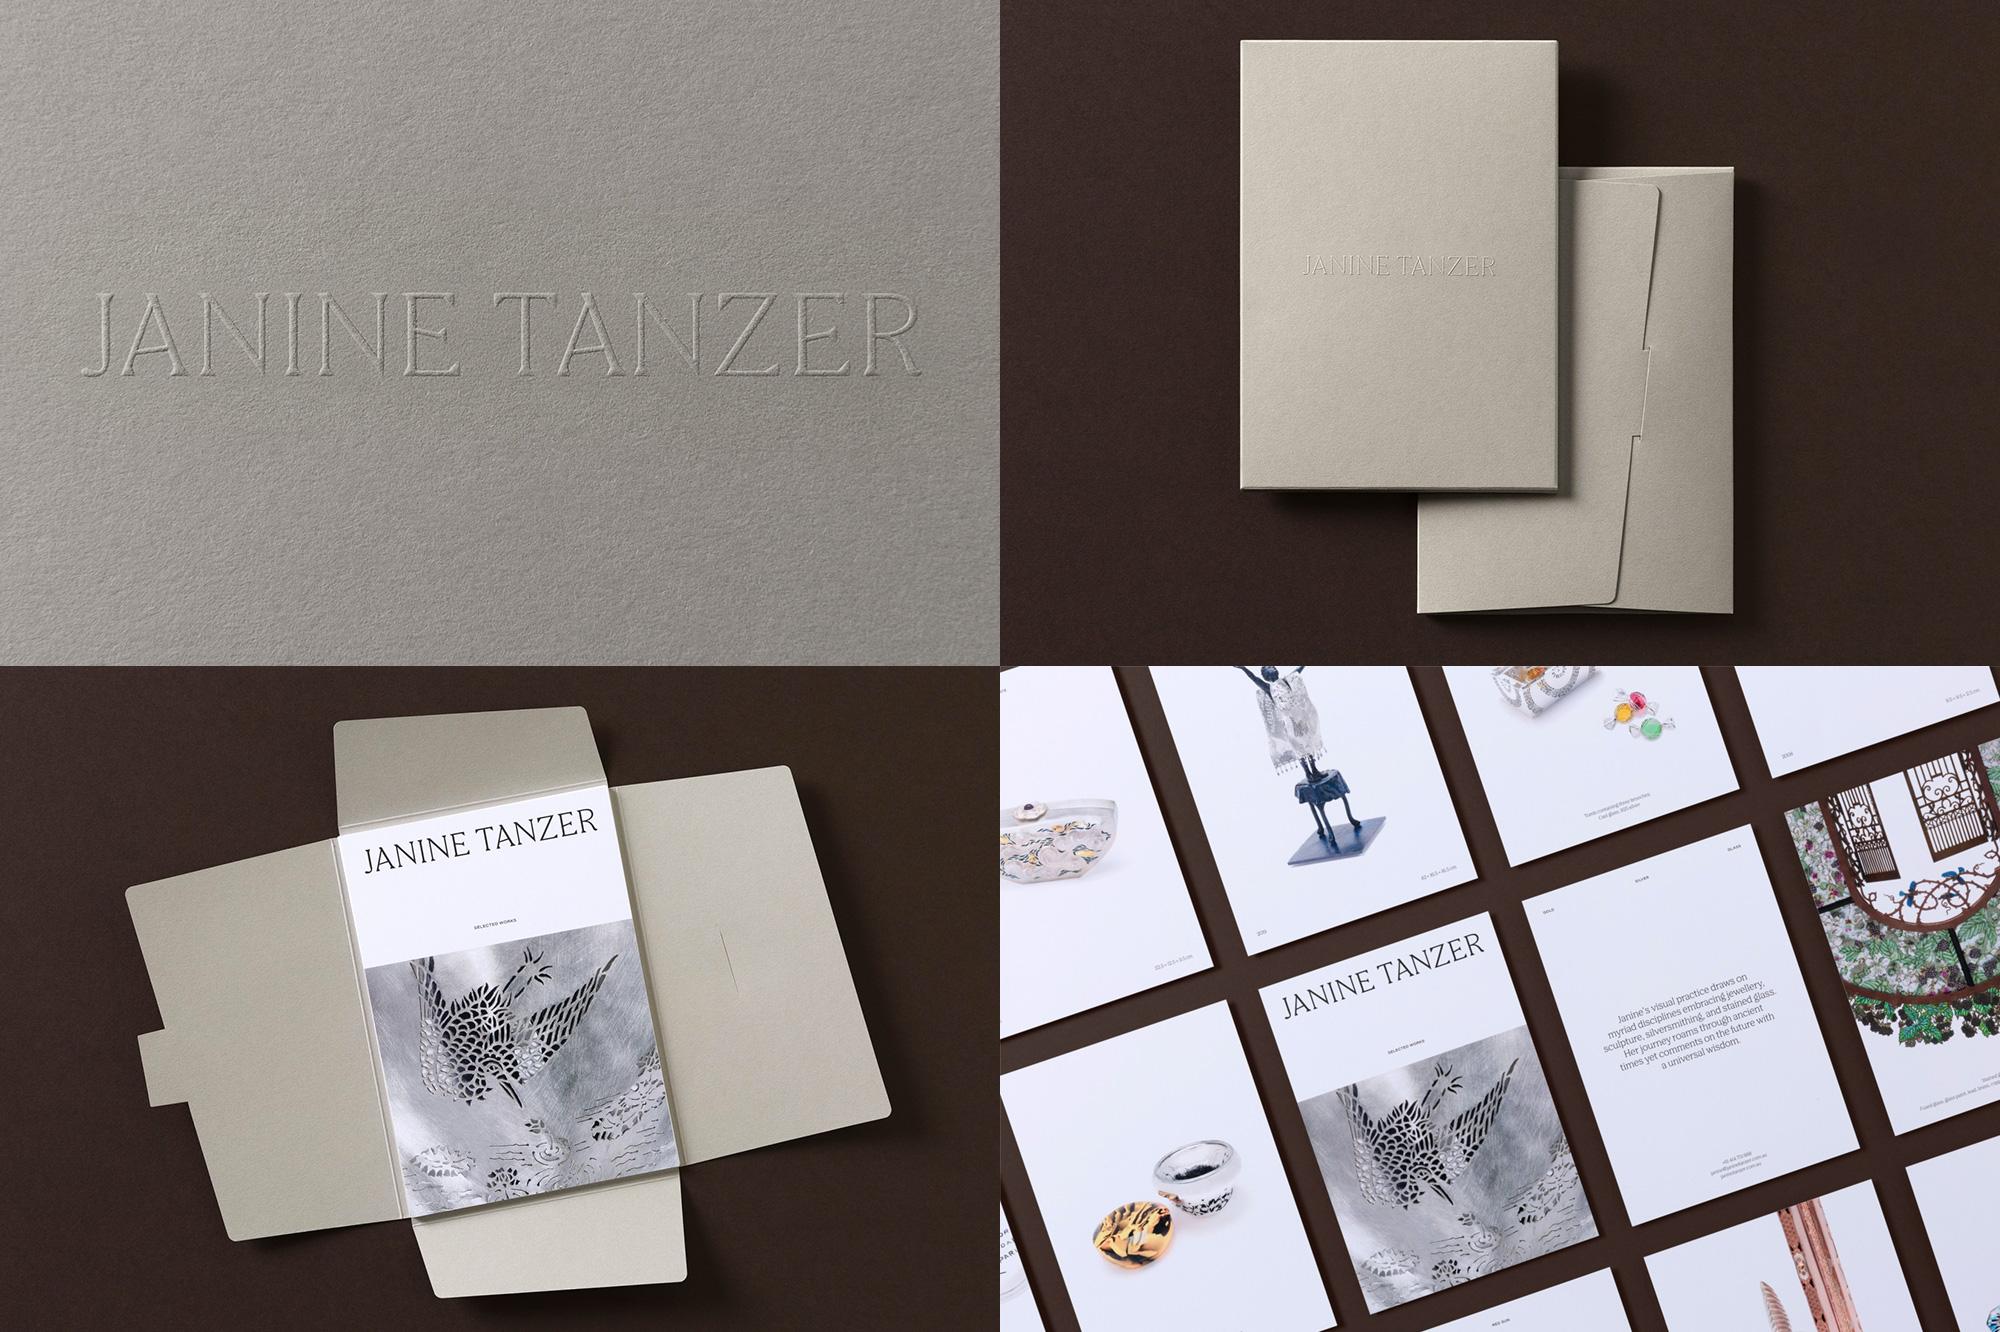 Janine Tanzer by Studio Brave